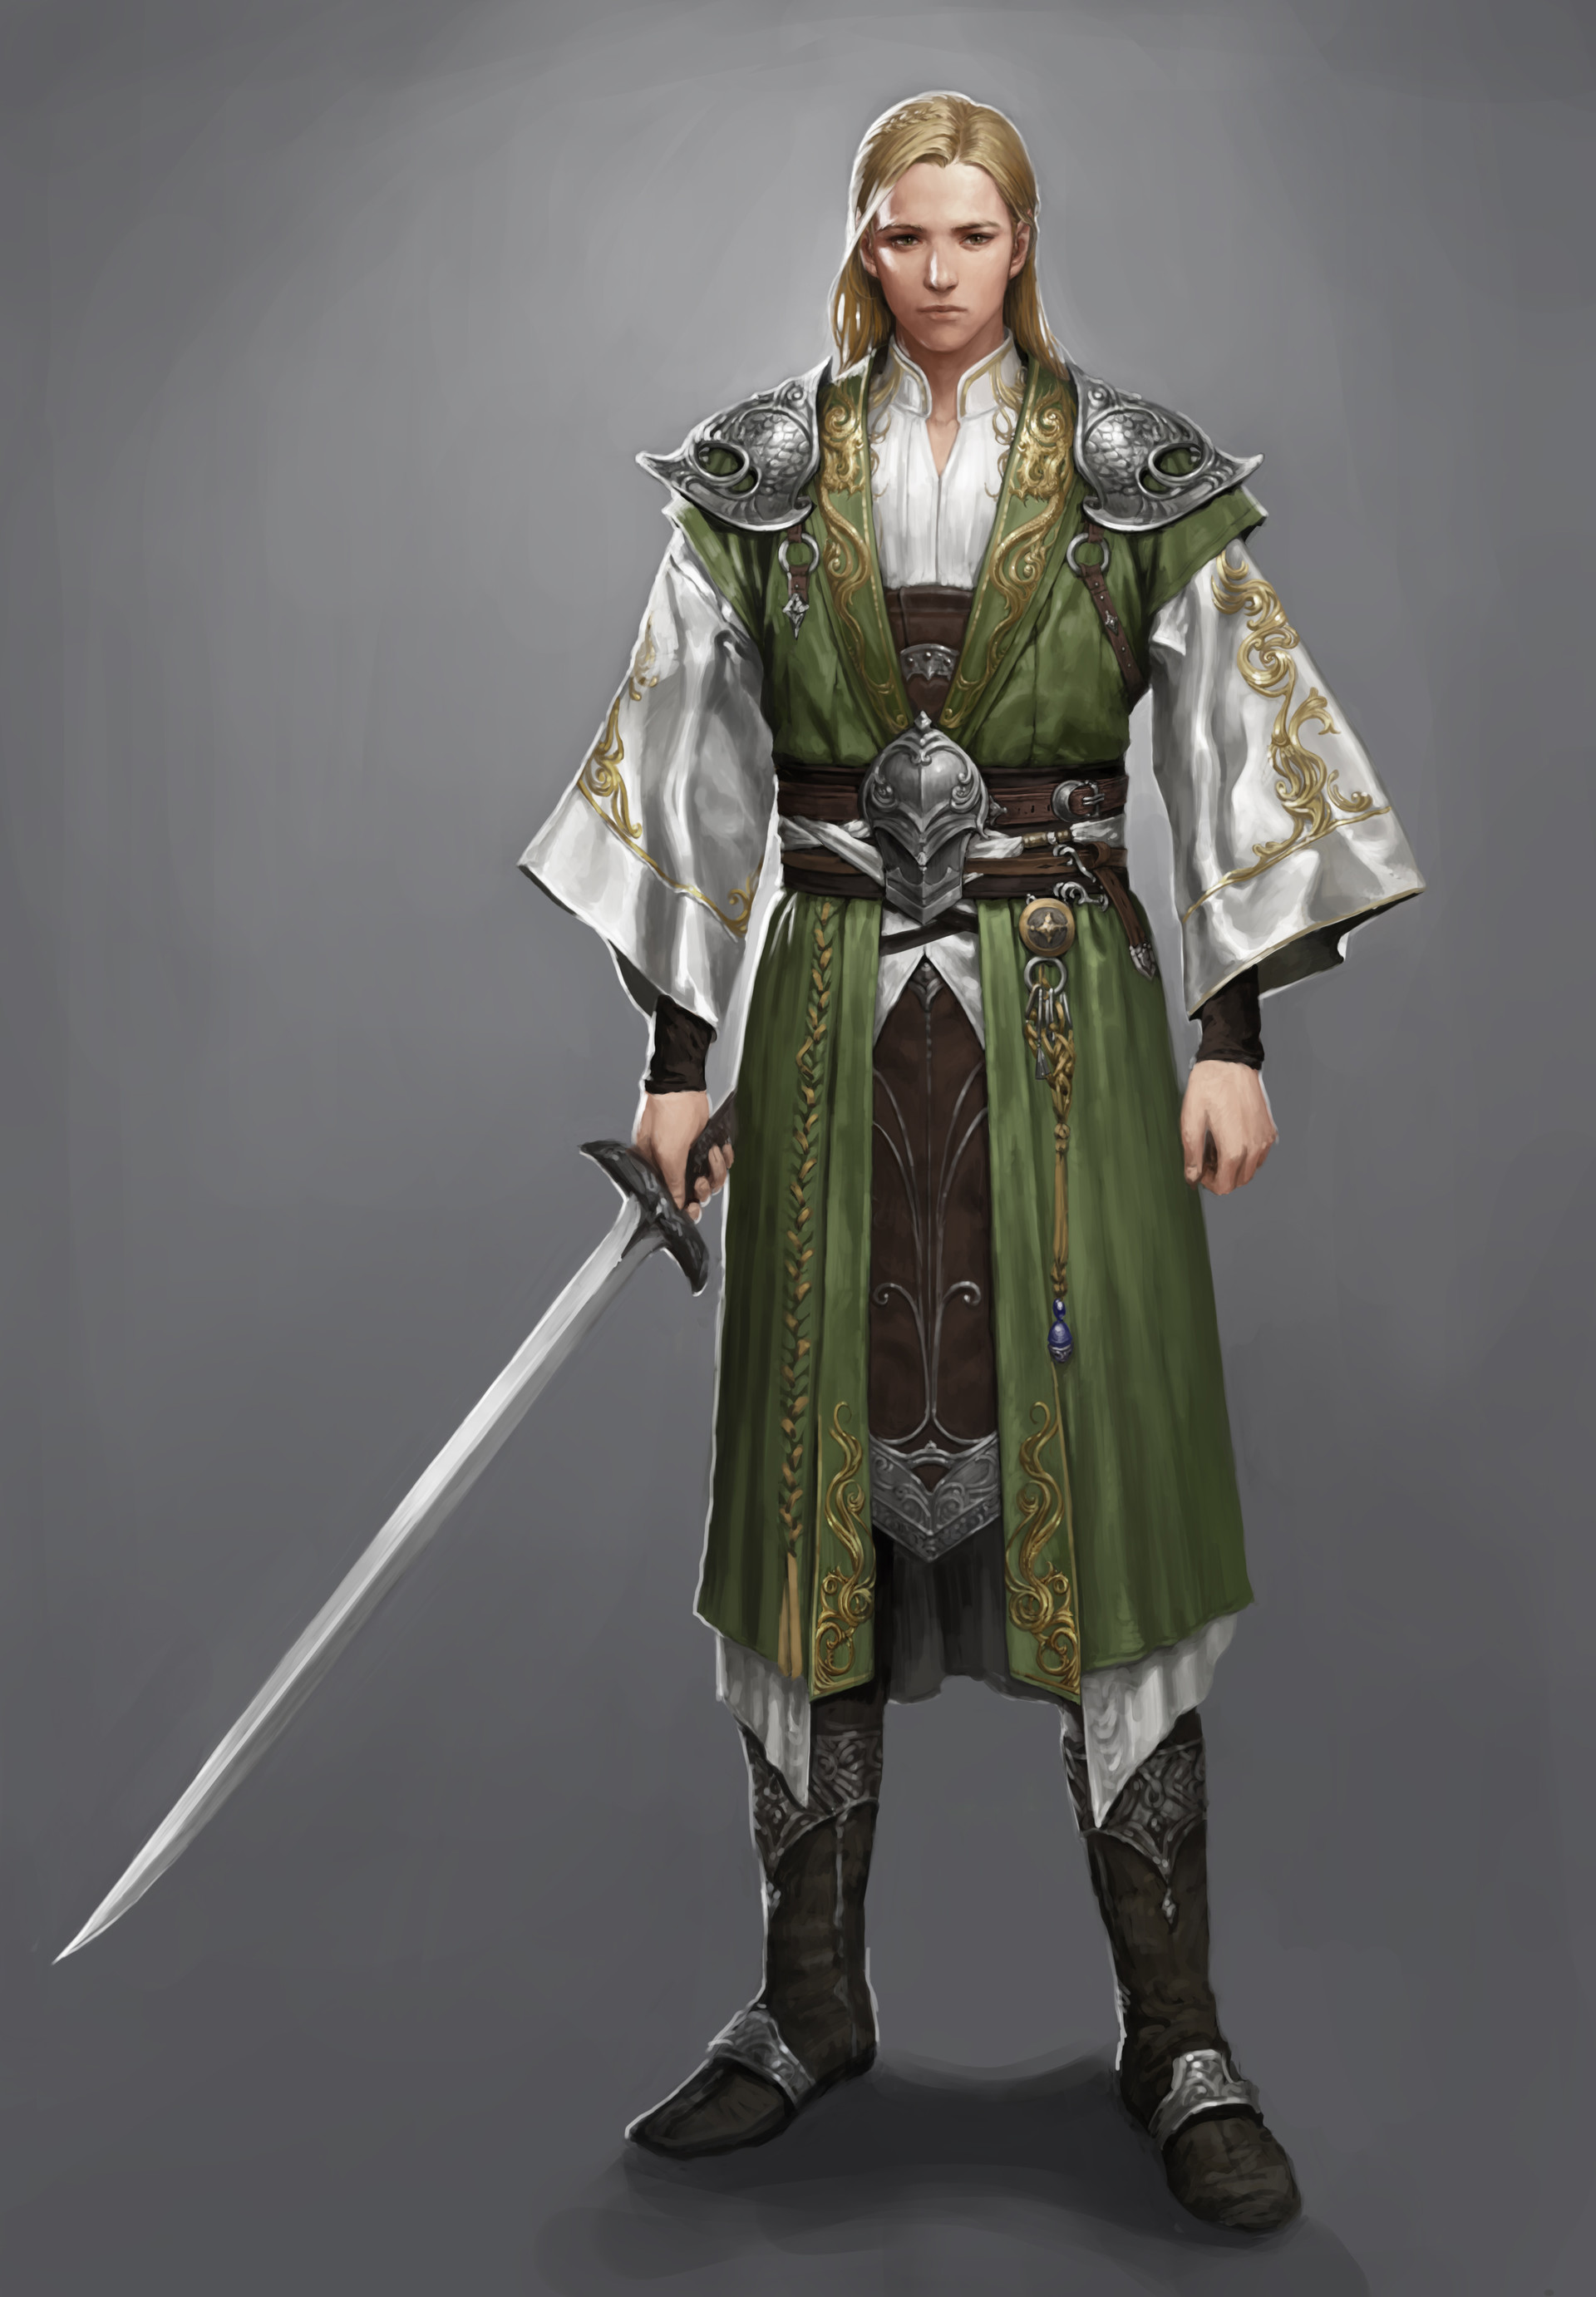 Shani Name 3d Wallpaper Artstation Elf Knight Jiyeon Ryu